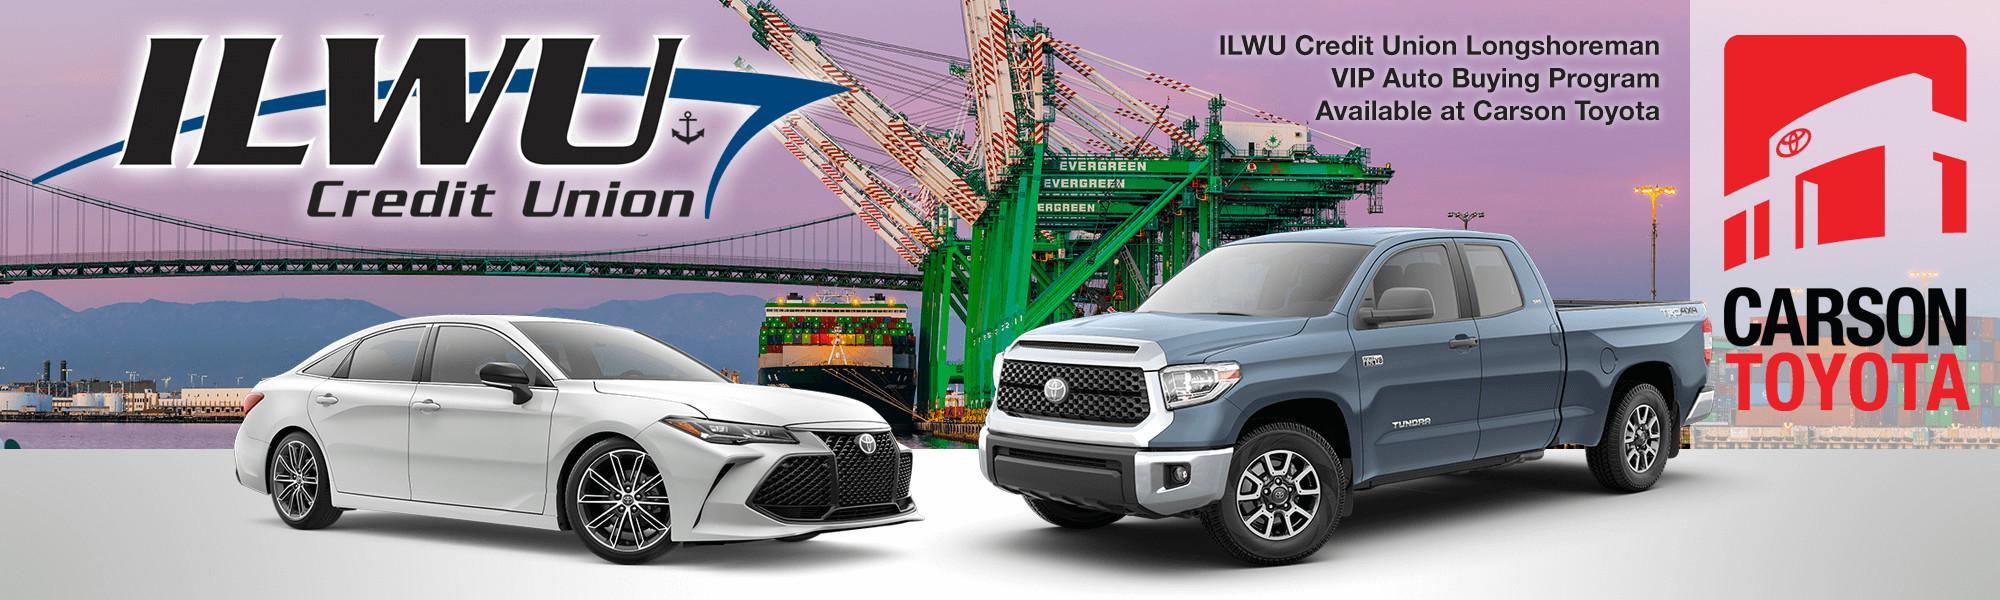 ILWU Credit Union Members Banner